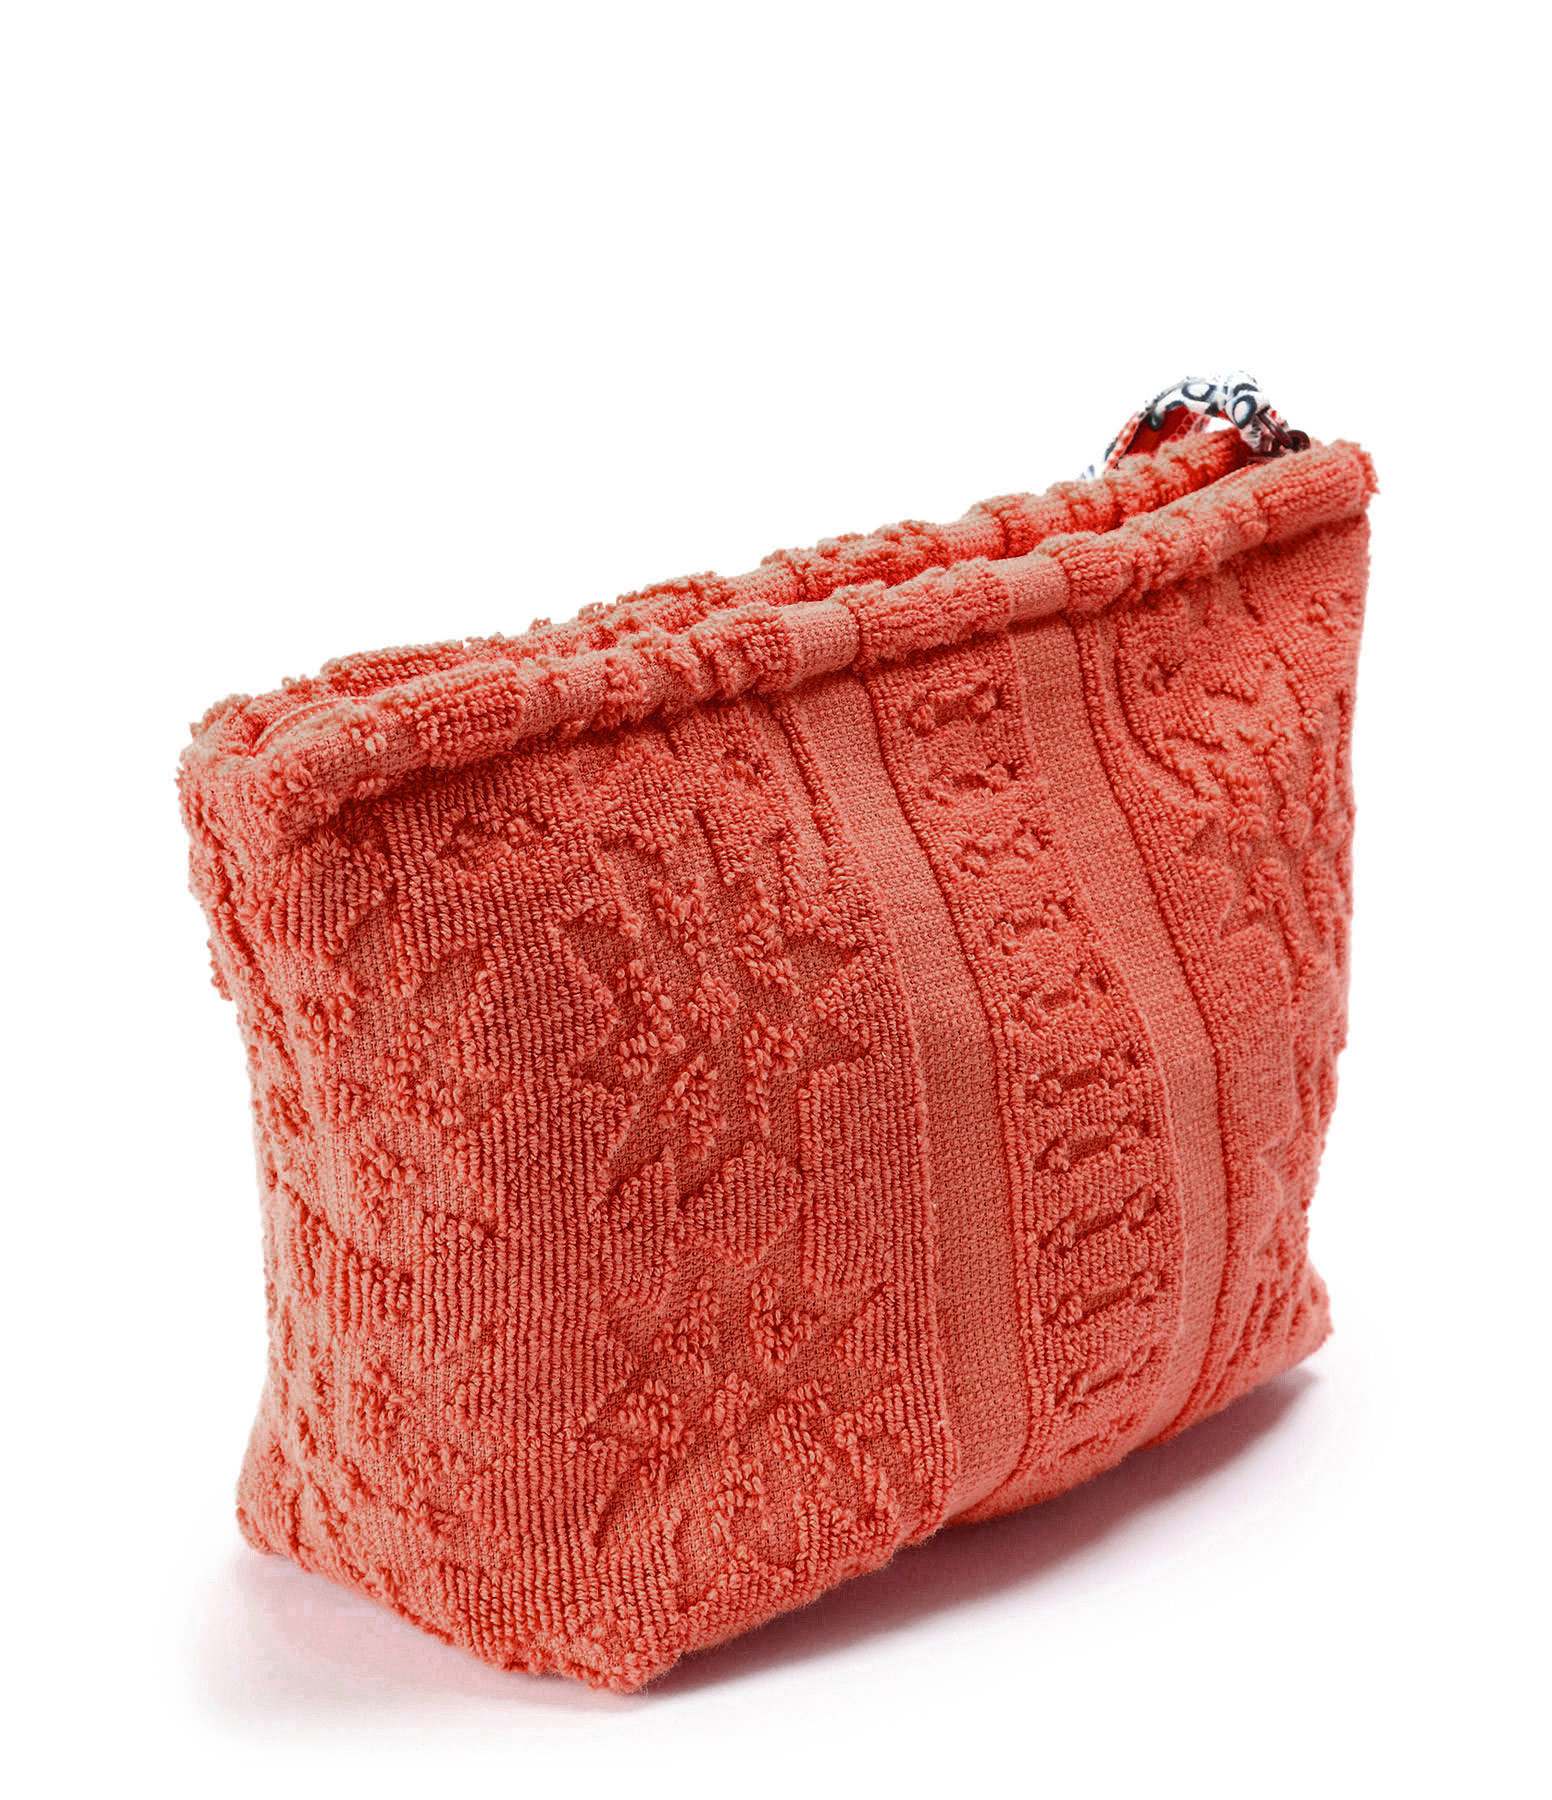 LALLA - Petite Trousse Walakin Éponge Terracotta